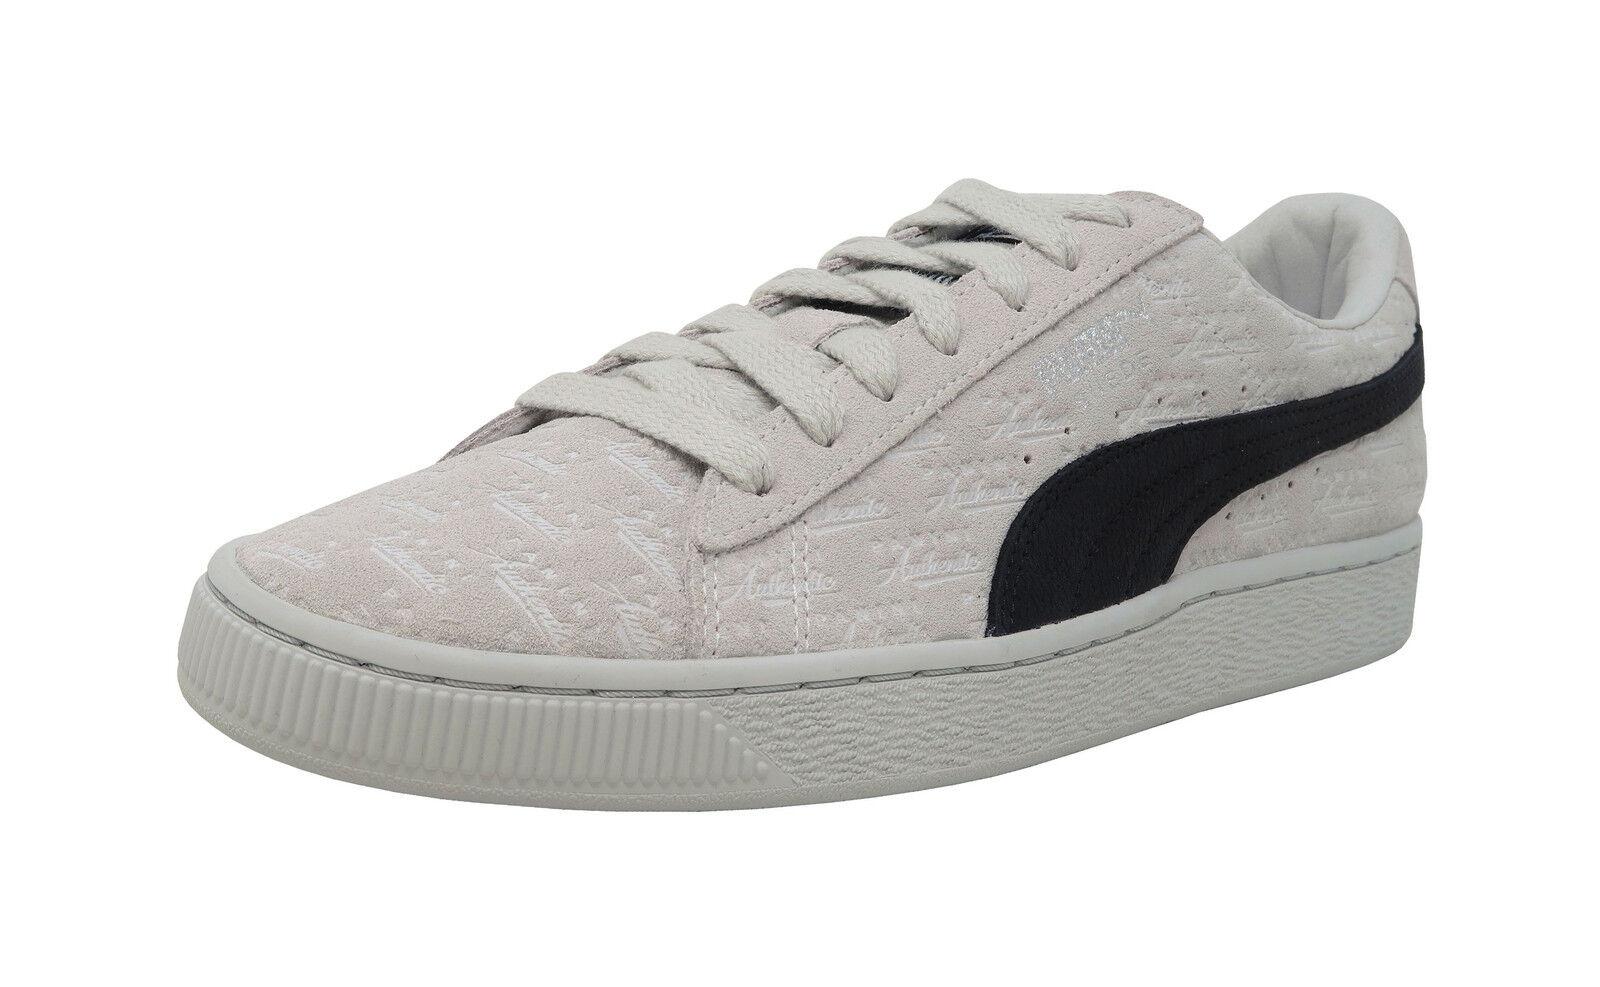 PUMA 50 50 50 Suede Classic X Panini White Black Lace Up Fashion Sneakers Men shoes 23c4f3